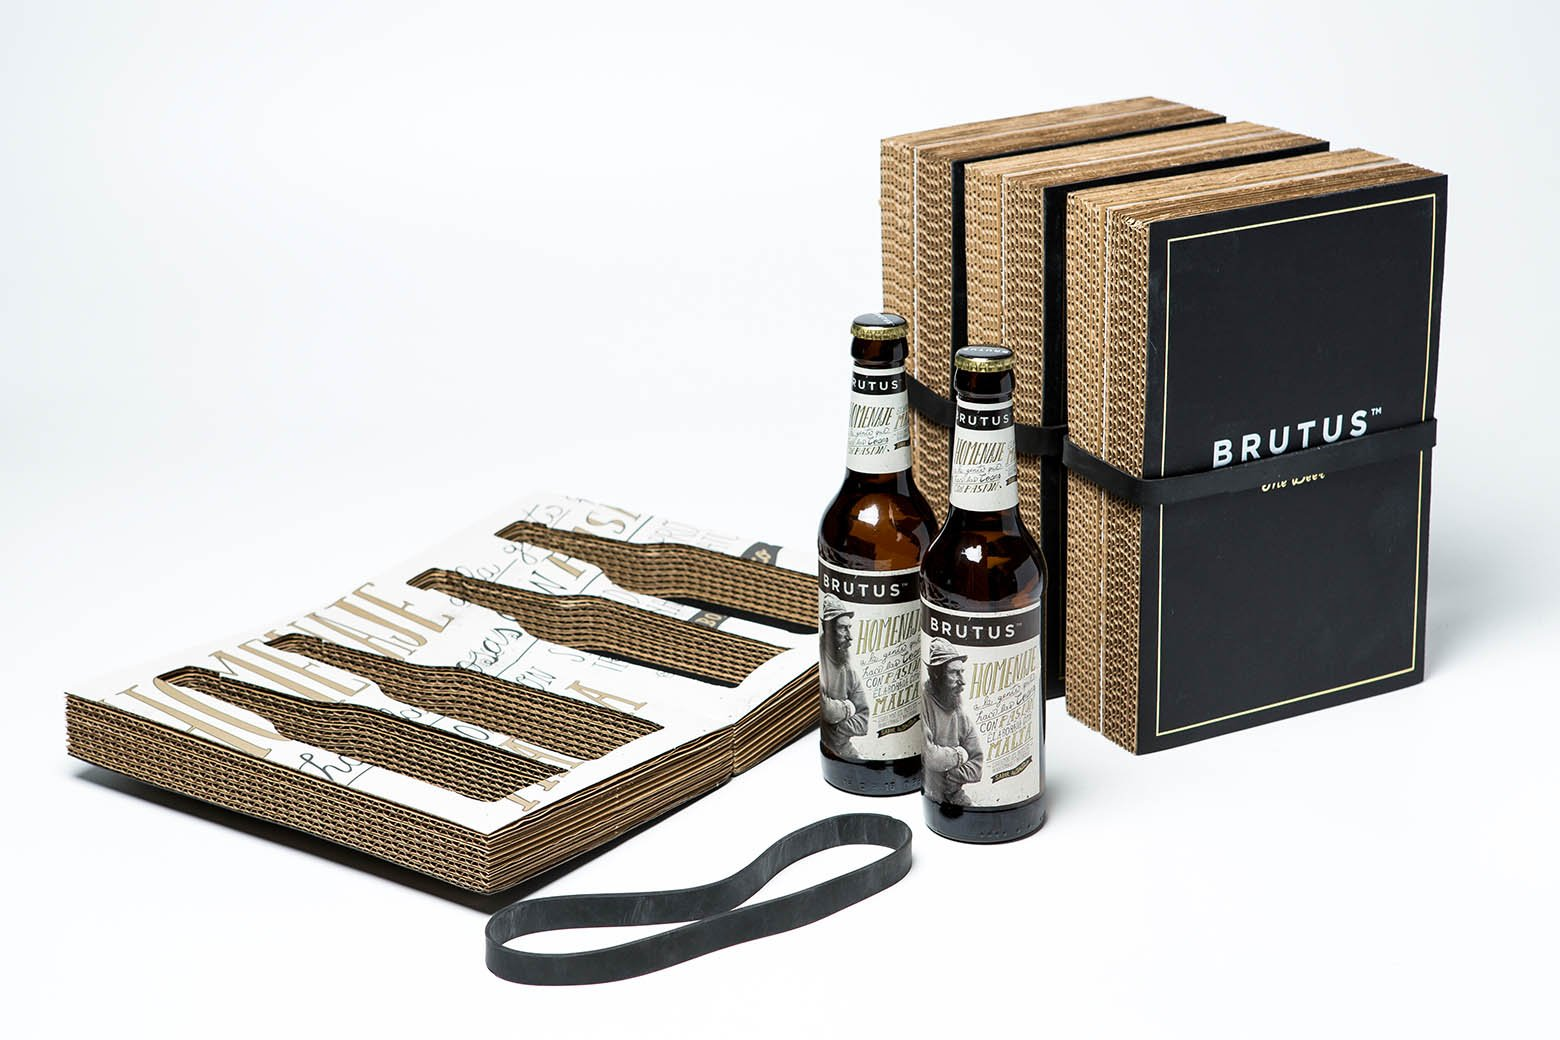 The Luxury Trends Brutus